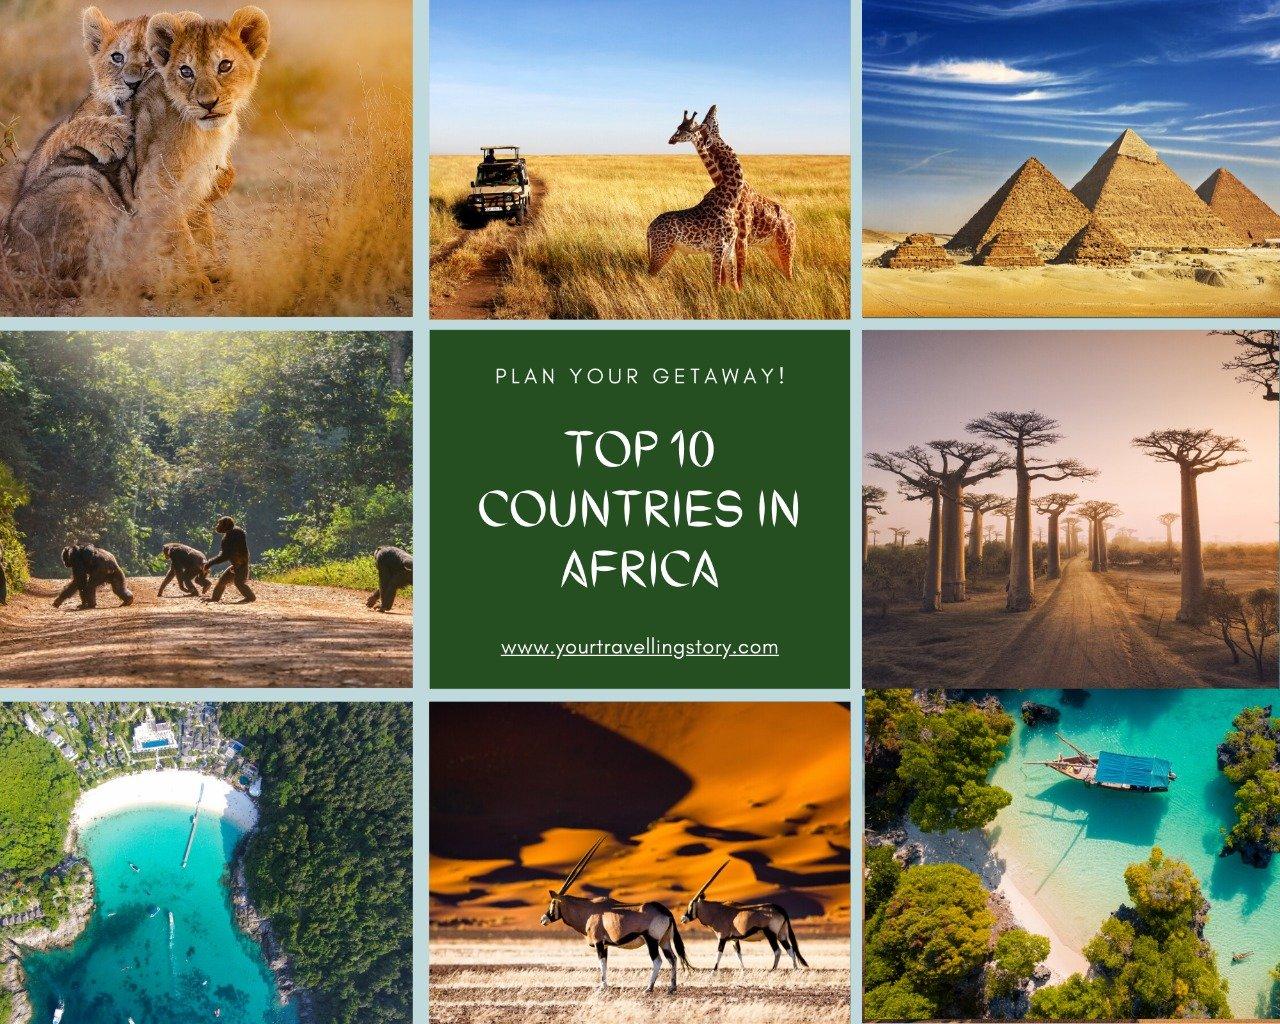 Best Places to Visit in Africa: 10 Tourist Destinations, Safari